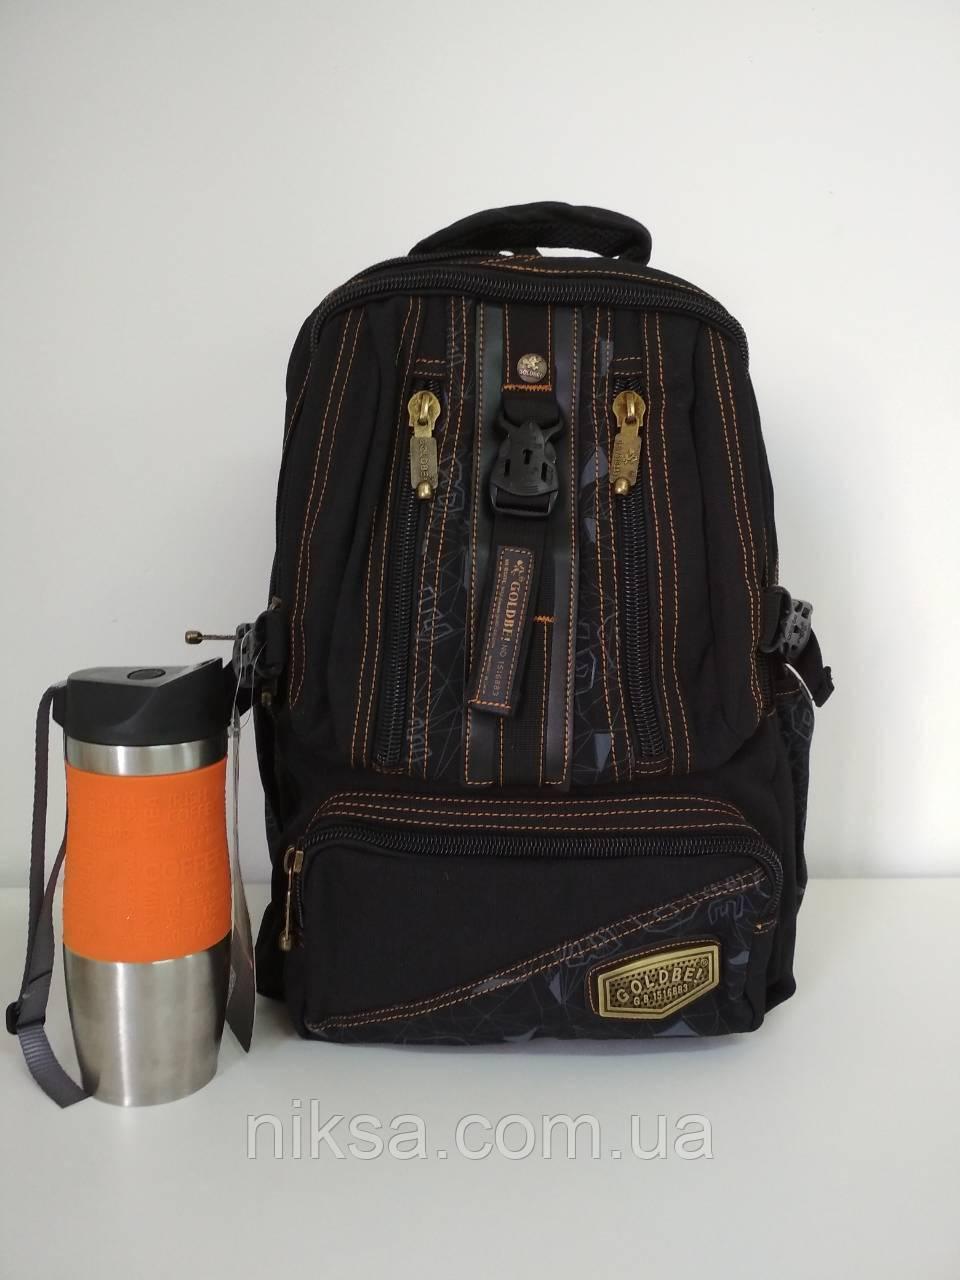 Рюкзак городской Cotton goldbe средний размер 40x18x30